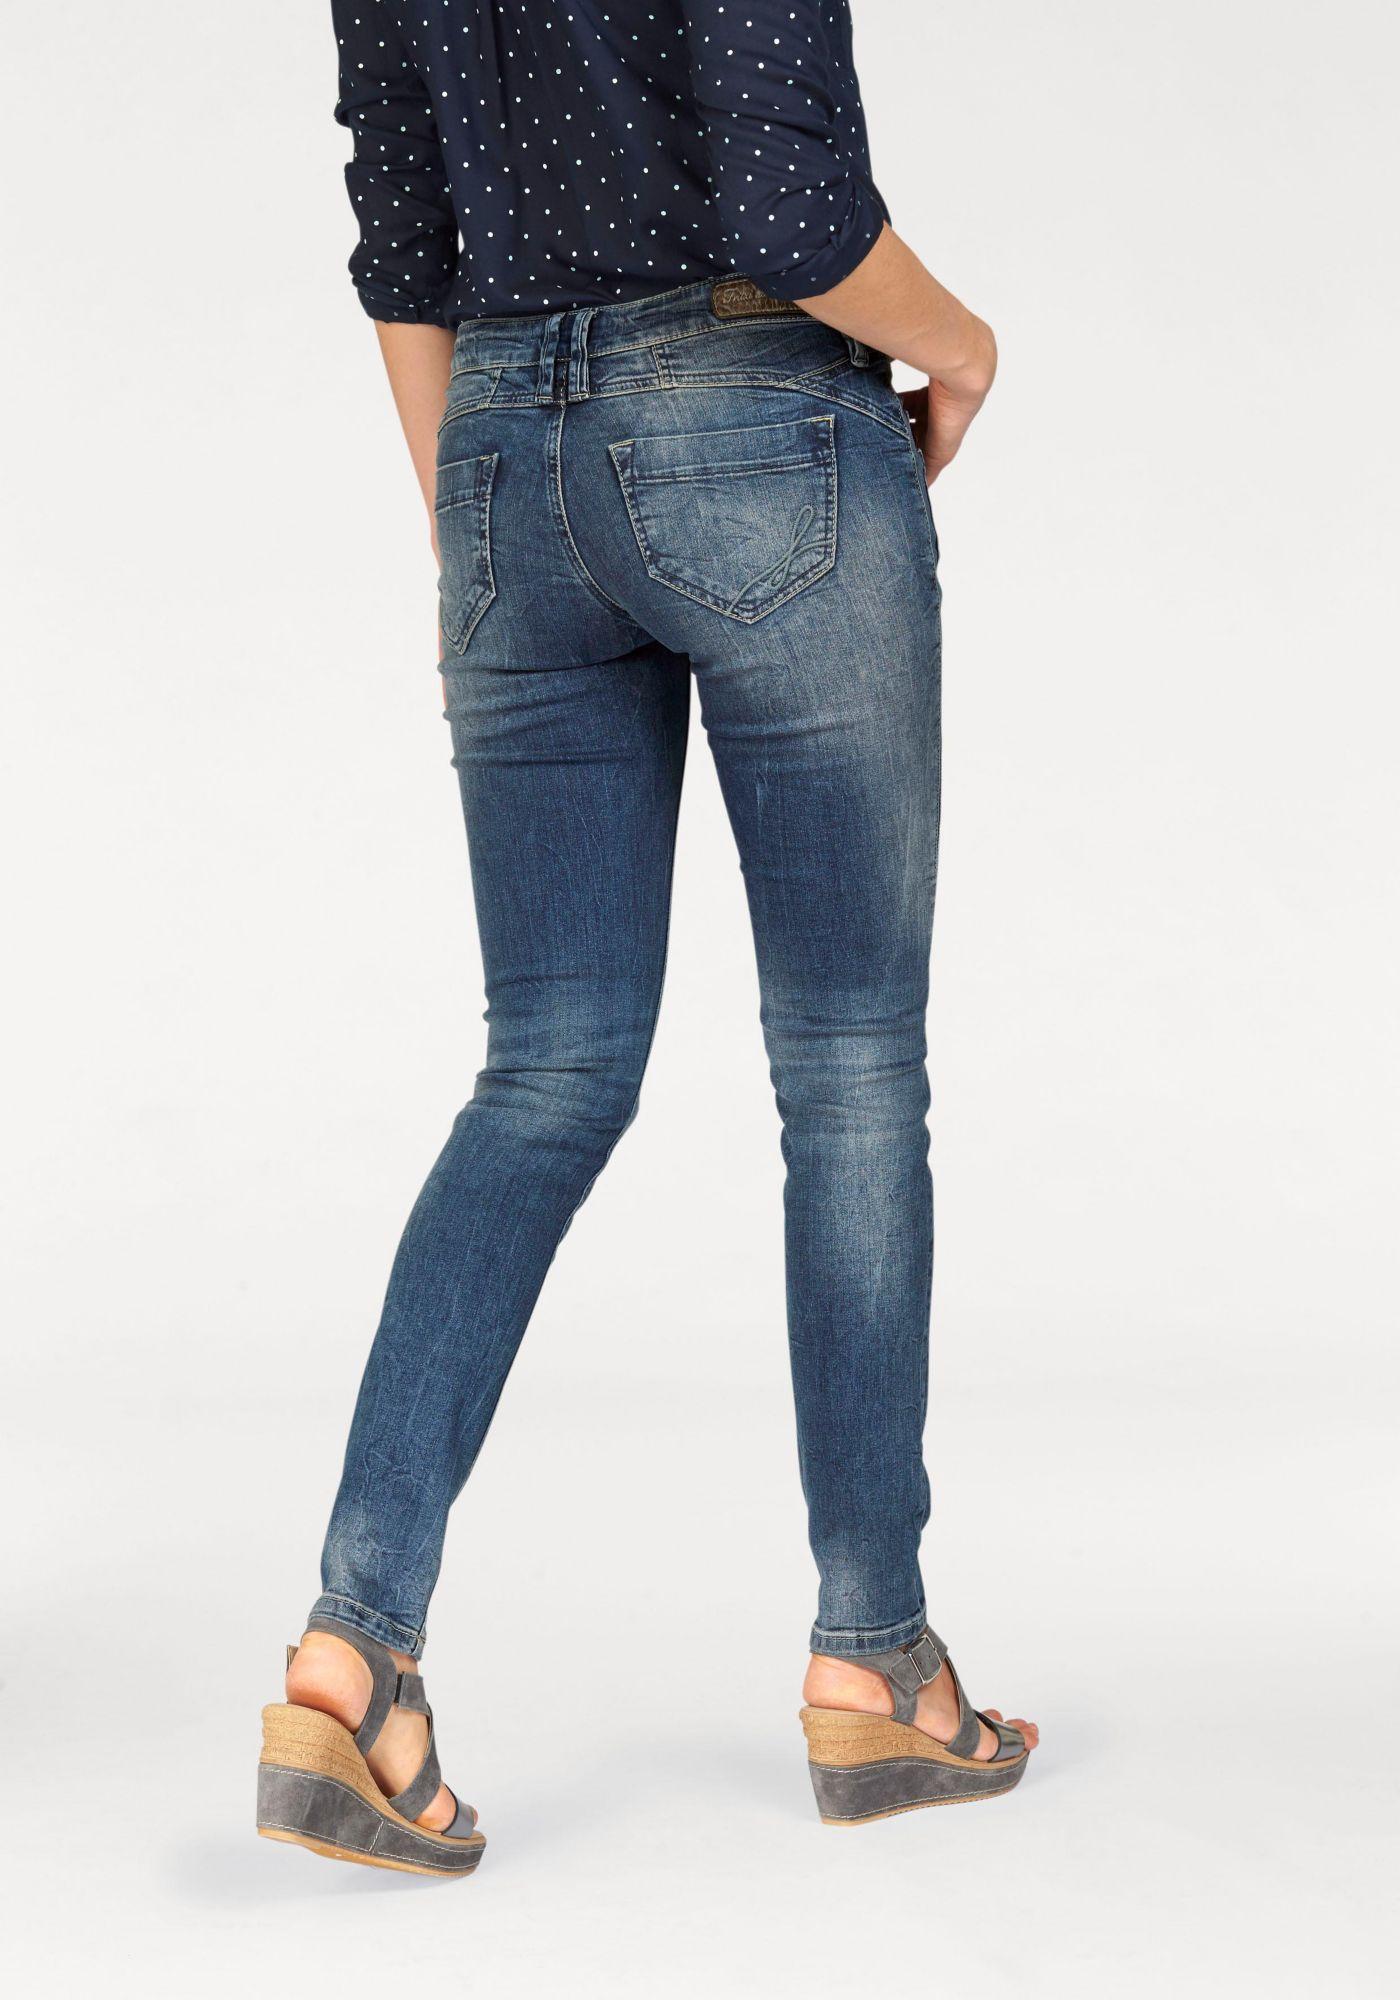 FRITZI AUS PREUßEN Fritzi aus Preußen Skinny-fit-Jeans »INDIANA«